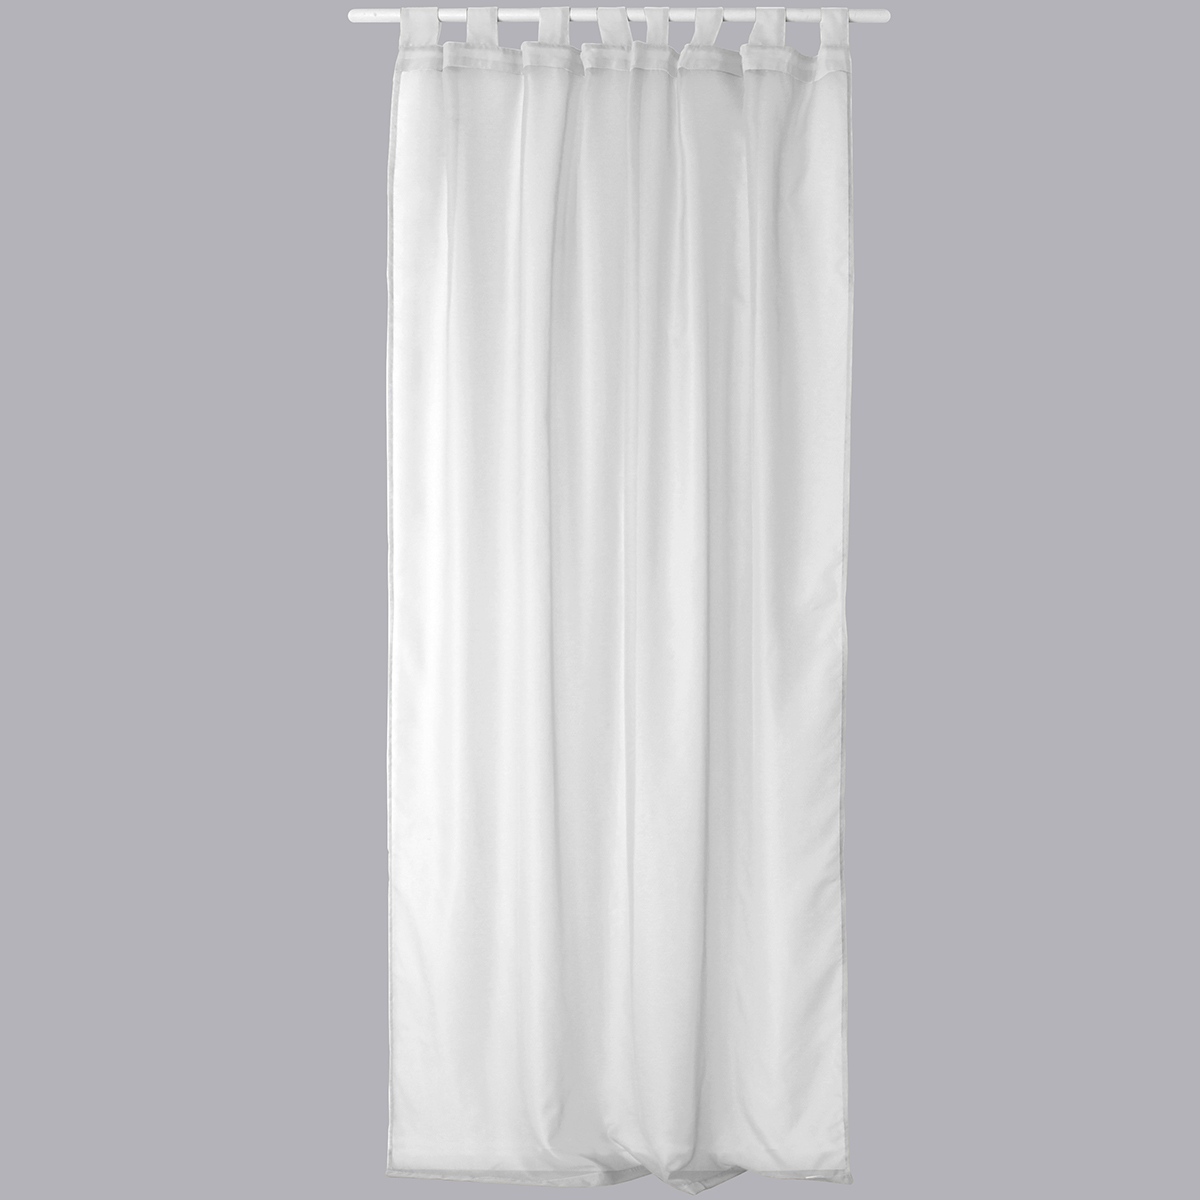 Voilage Uni en Polyester 8 pattes  (Blanc)